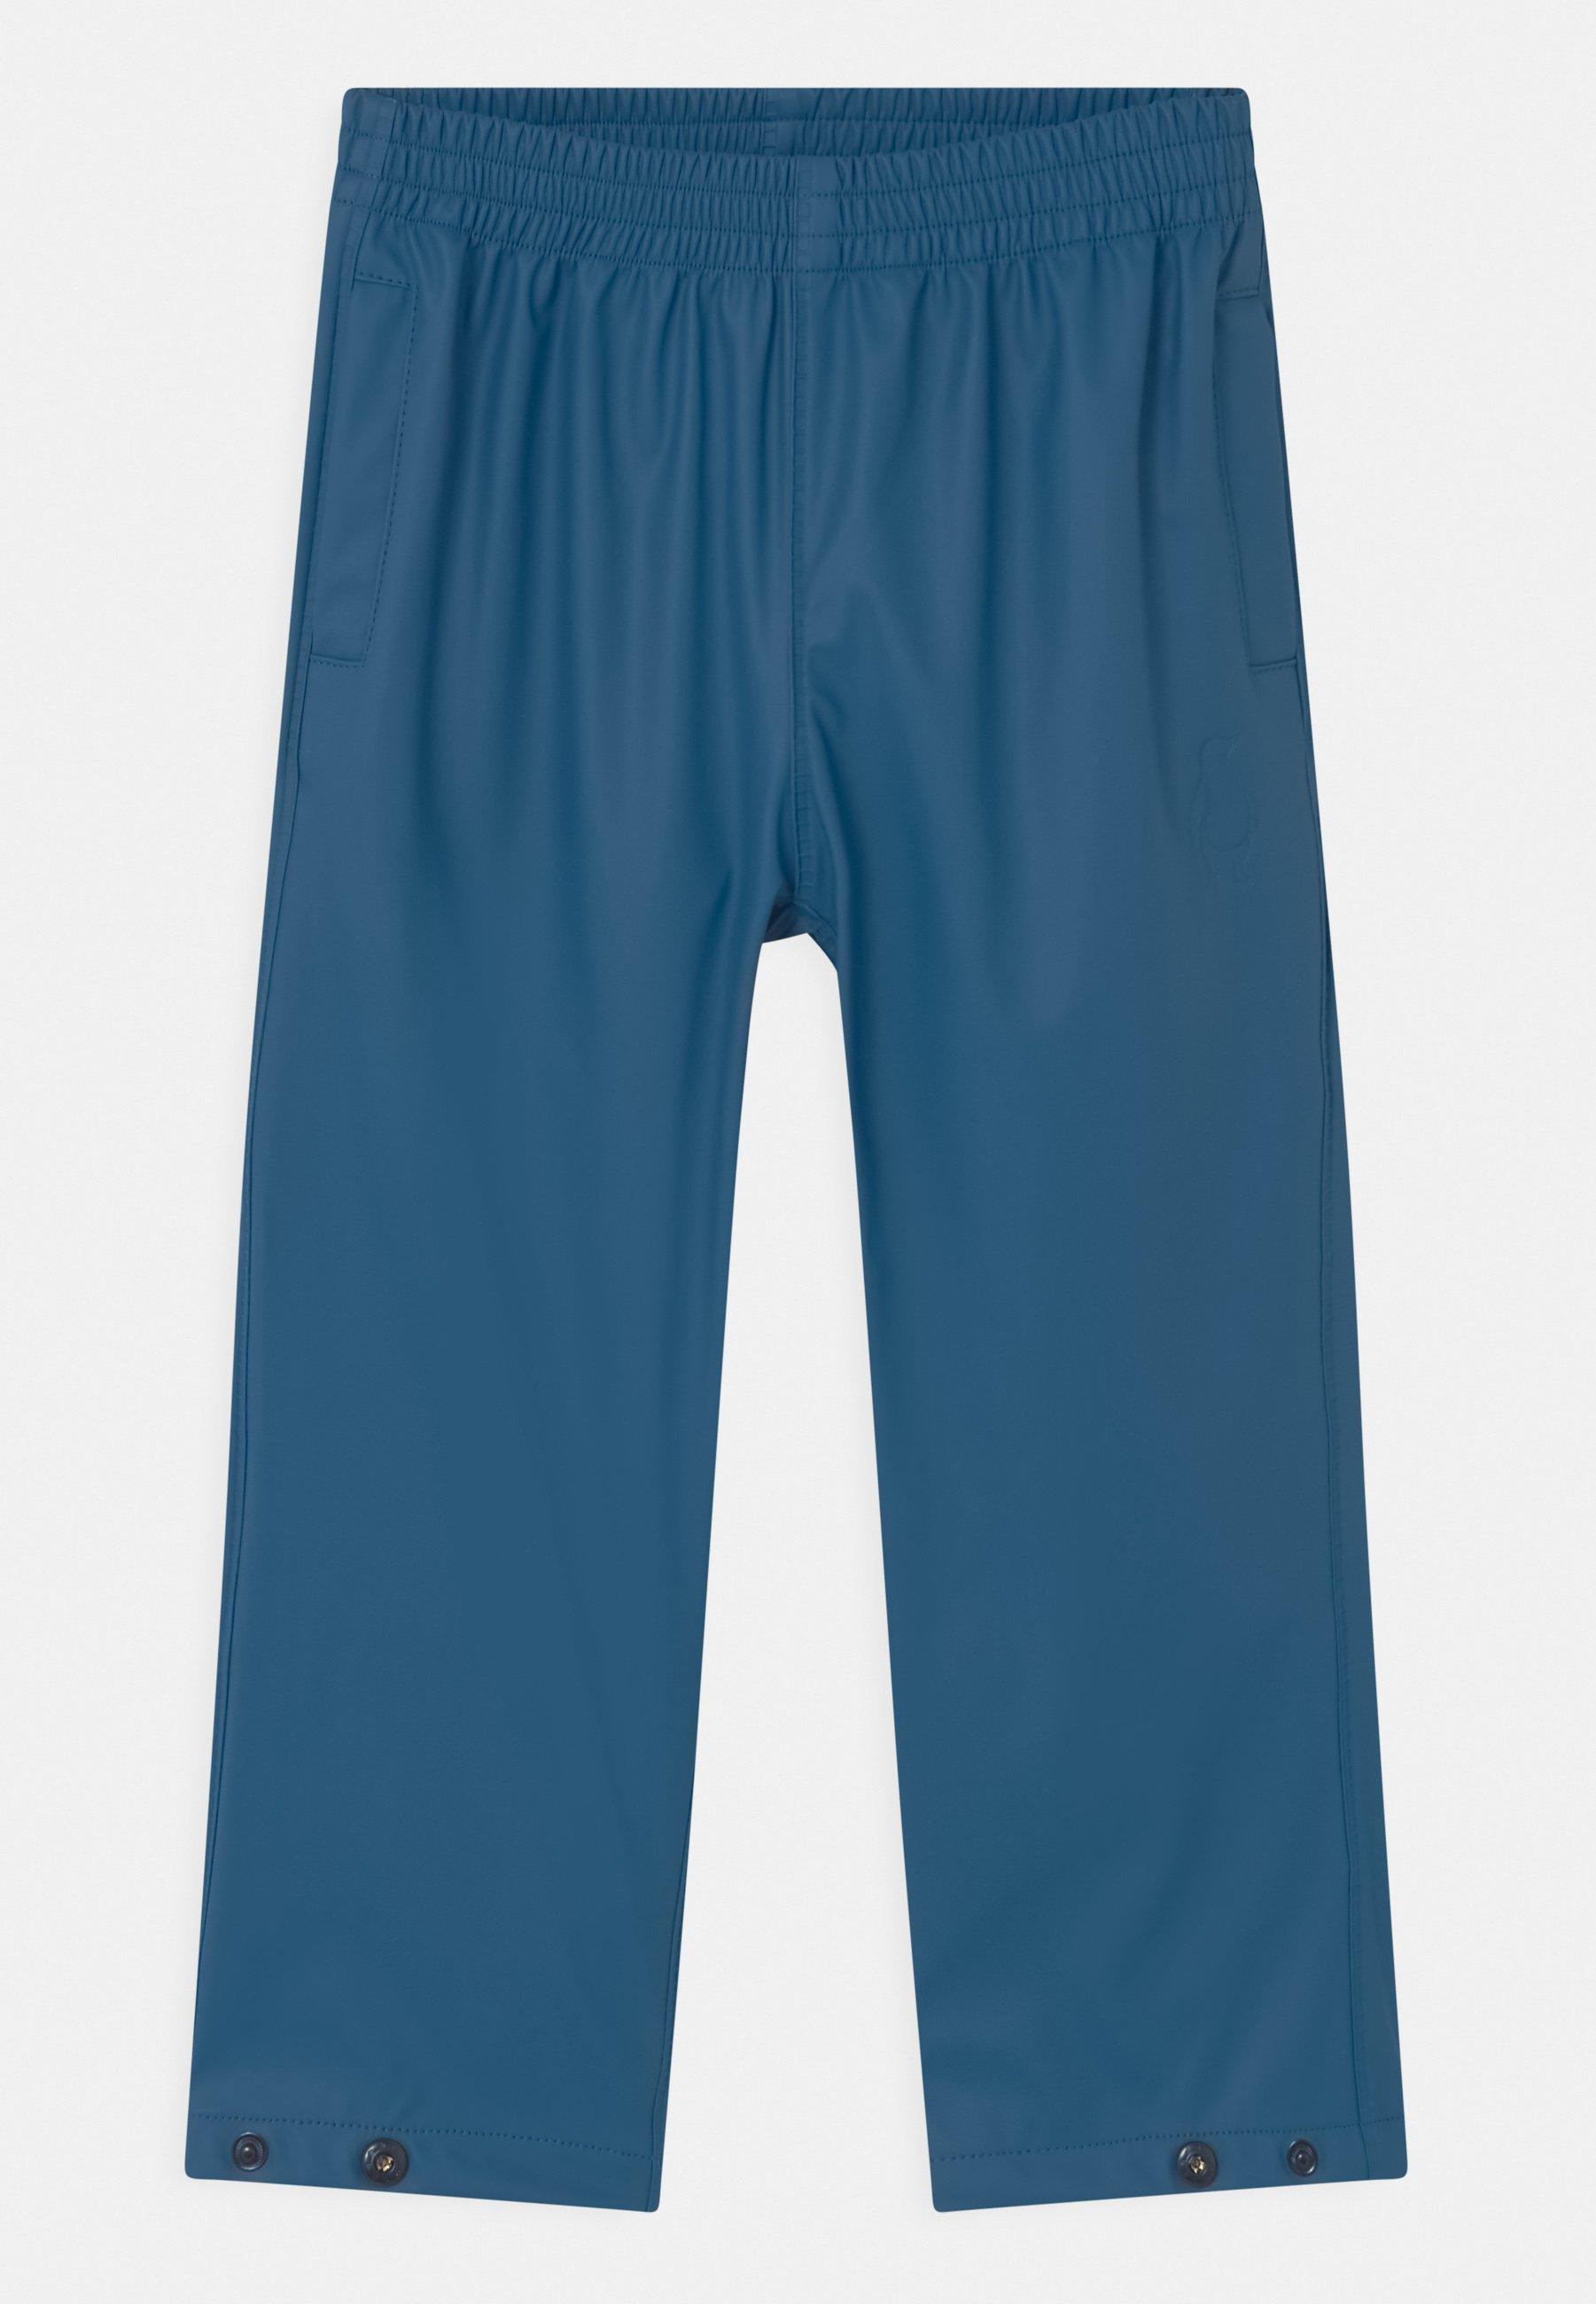 Kids HIDDEN DRAGON UNISEX - Rain trousers